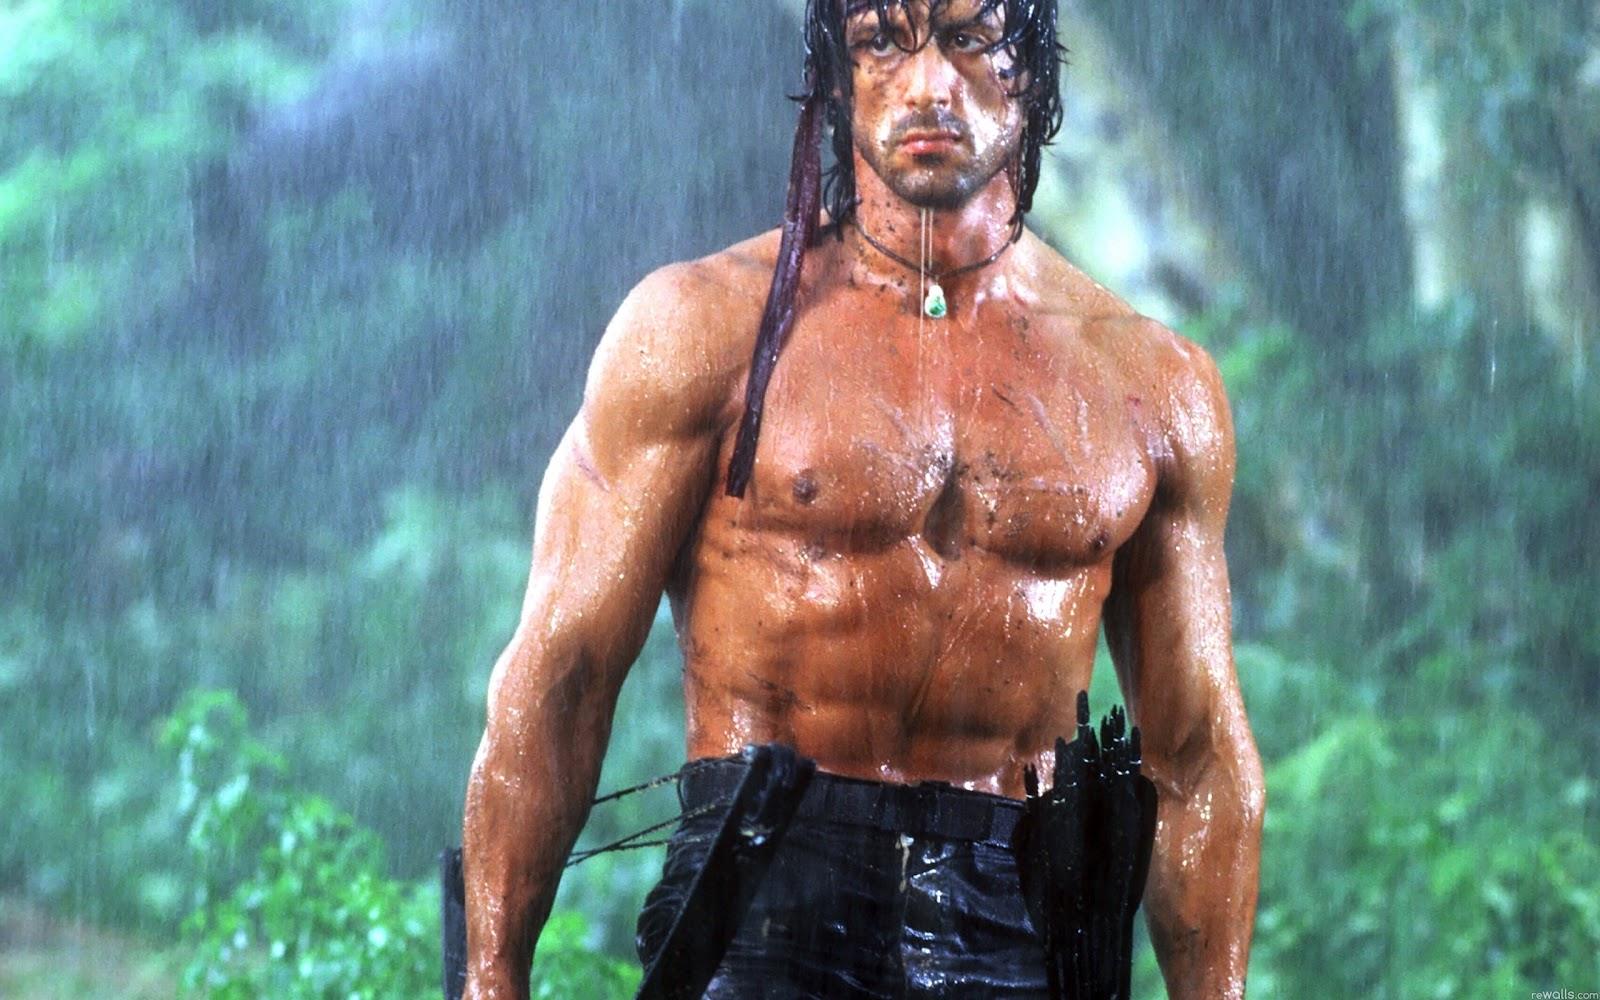 http://3.bp.blogspot.com/-pBG47rVquik/T5zUy9432eI/AAAAAAAABew/yO5SBLp1b8Y/s1600/Wallpaper-Rambo-Sylvester-Stallone-the-hero-desktop.jpg